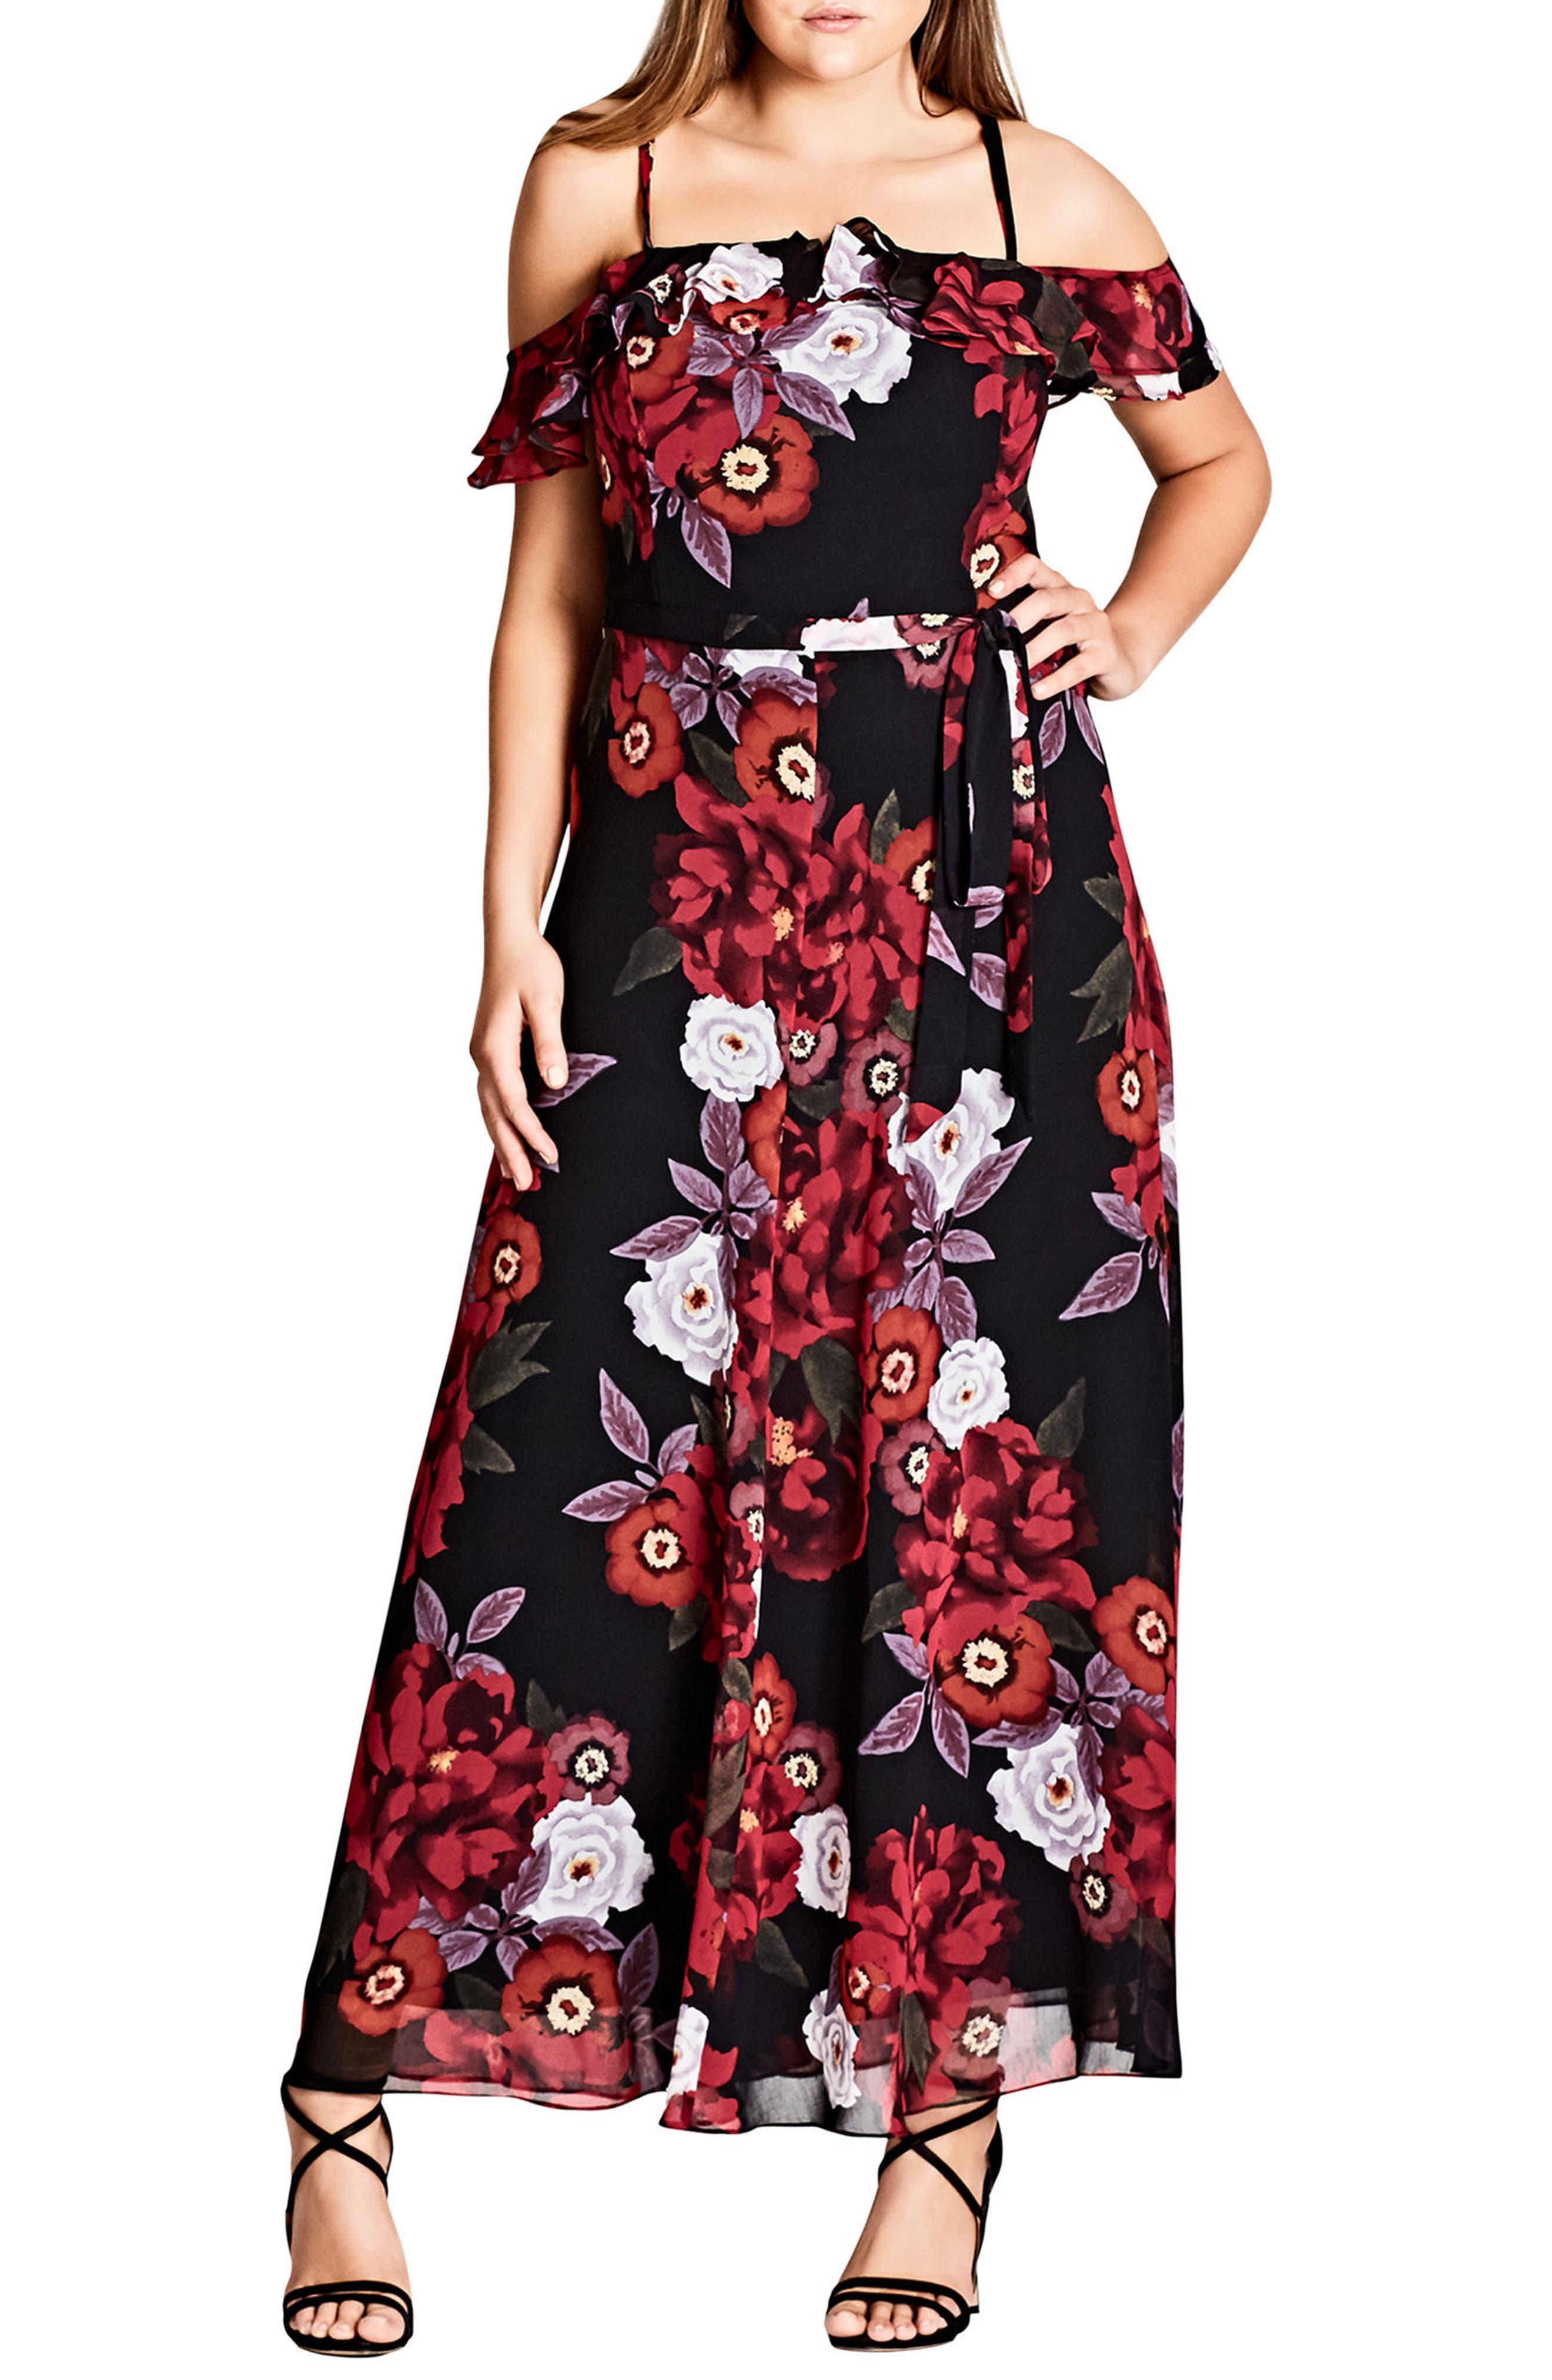 Chic City Rich Rose Maxi Dress,                             Main thumbnail 1, color,                             001